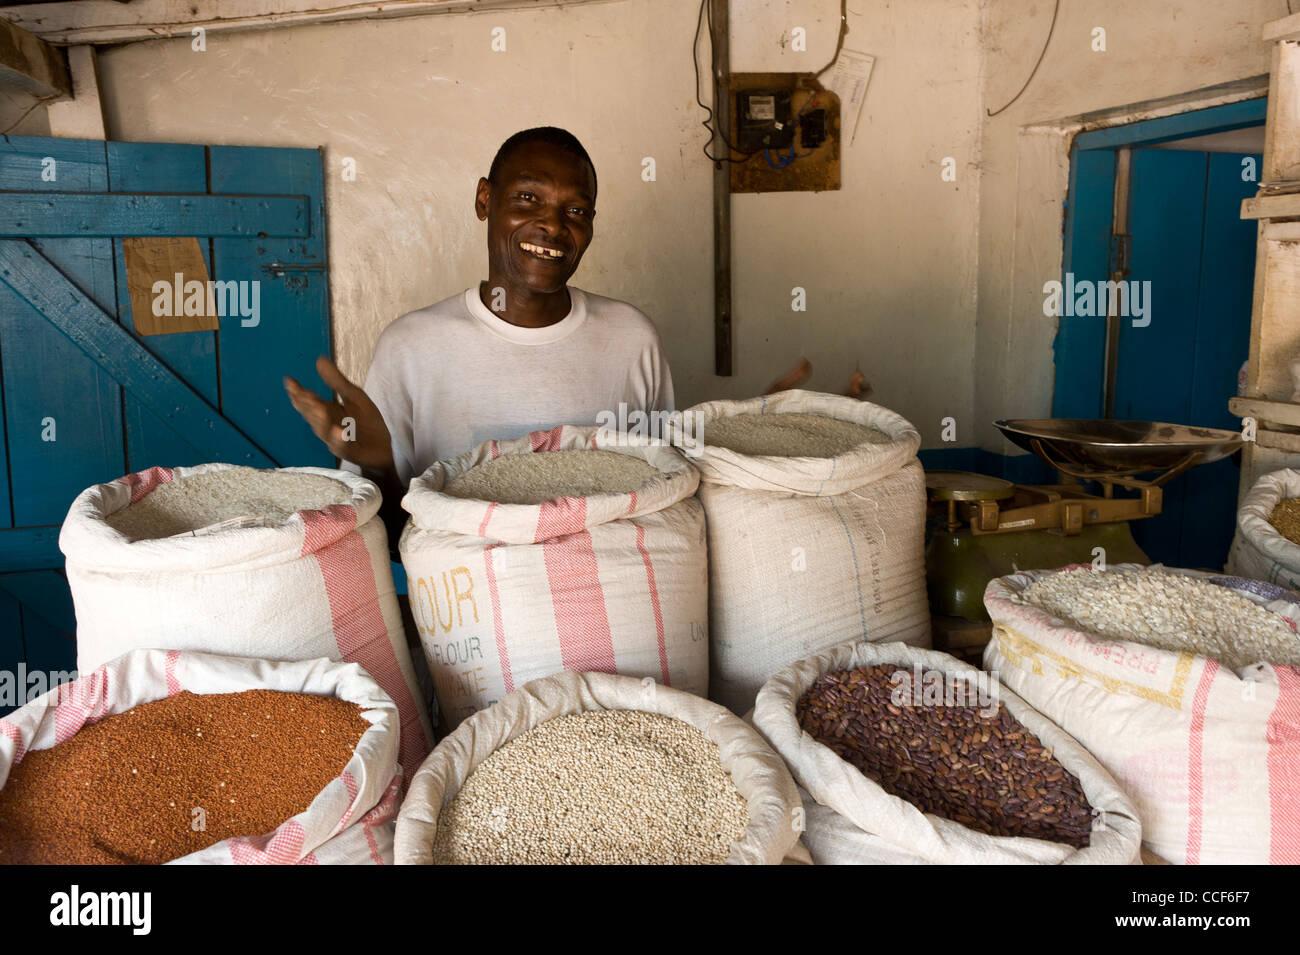 A man sells rice and pulses in Moshi Kilimanjaro Region Tanzania Stock Photo